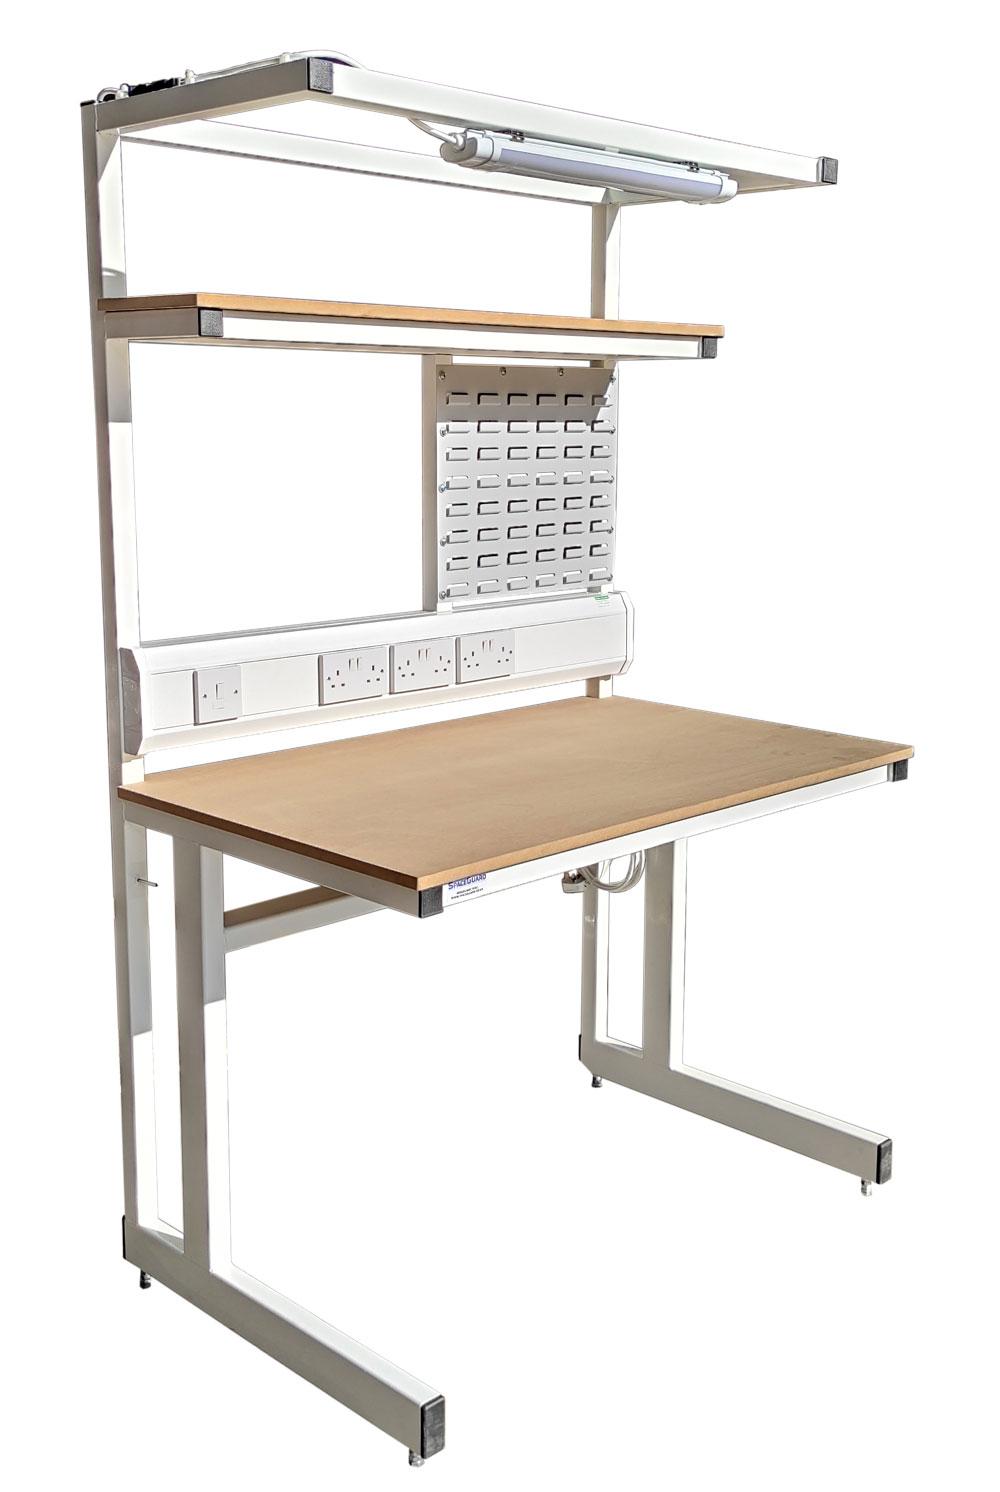 Workbench with shelves, louvre panel, & lighting